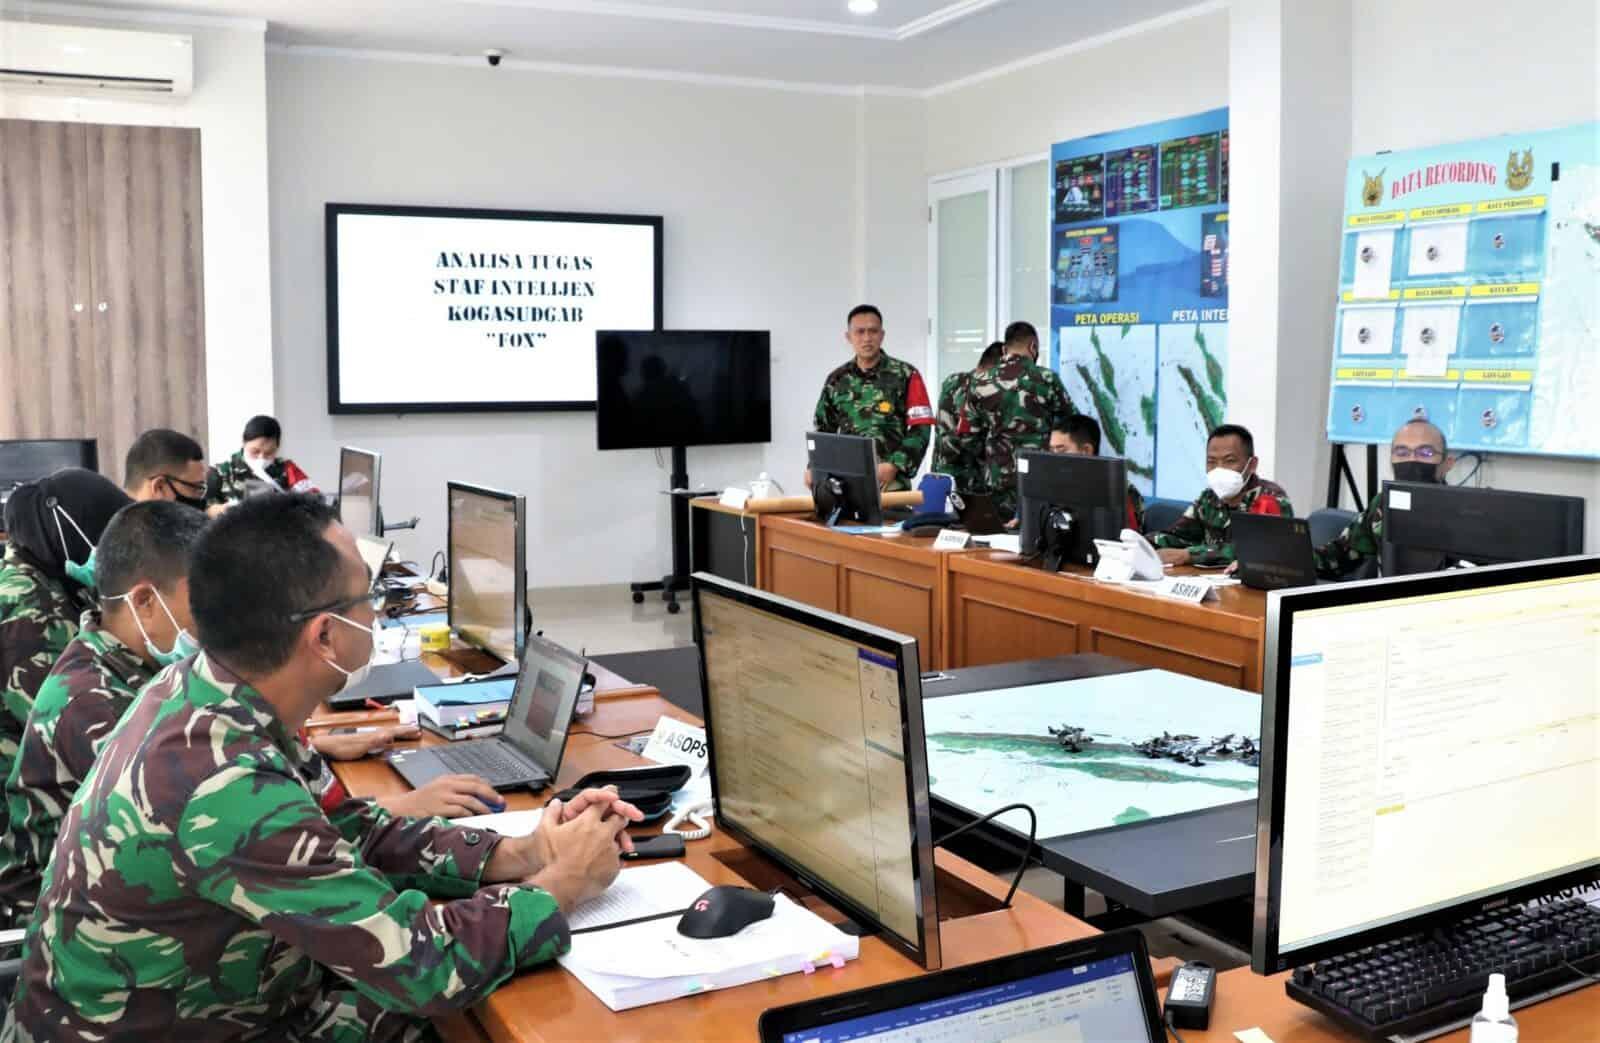 177 Perwira Siswa Ikuti Latihan Posko OYU Matra I